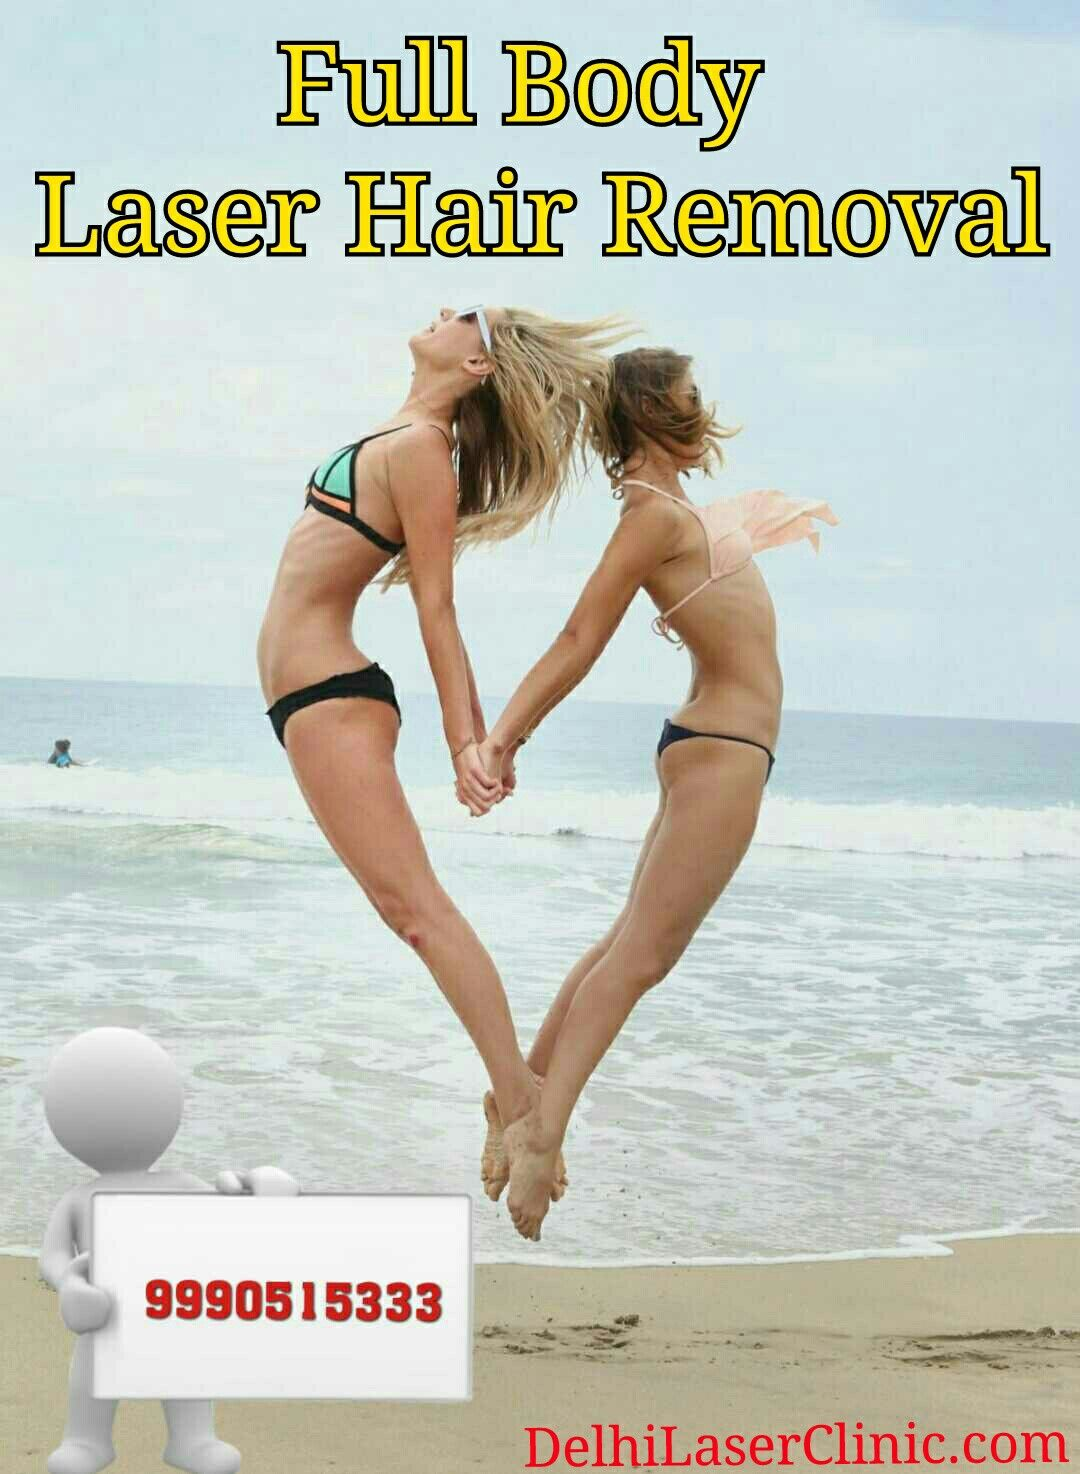 Laser Hair Removal In Dwarka Delhi Cost Of Laser Hair Removal